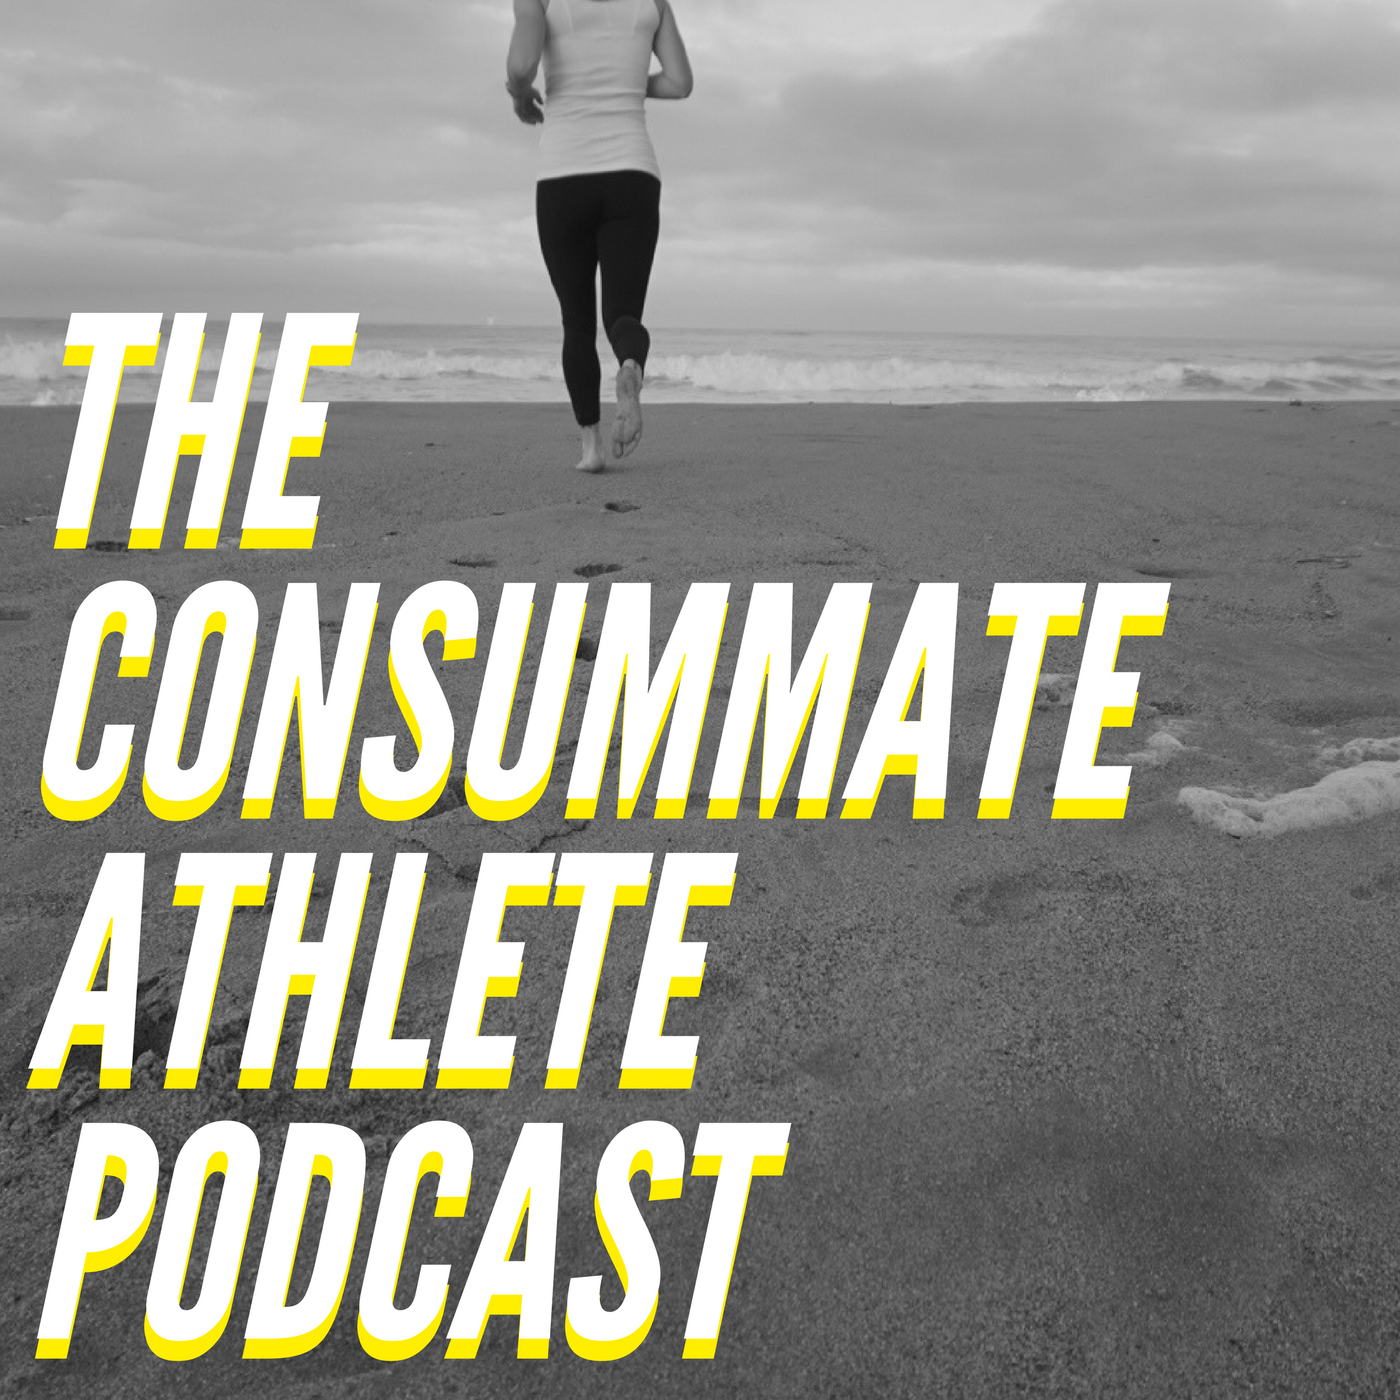 Consummate Athlete Podcast